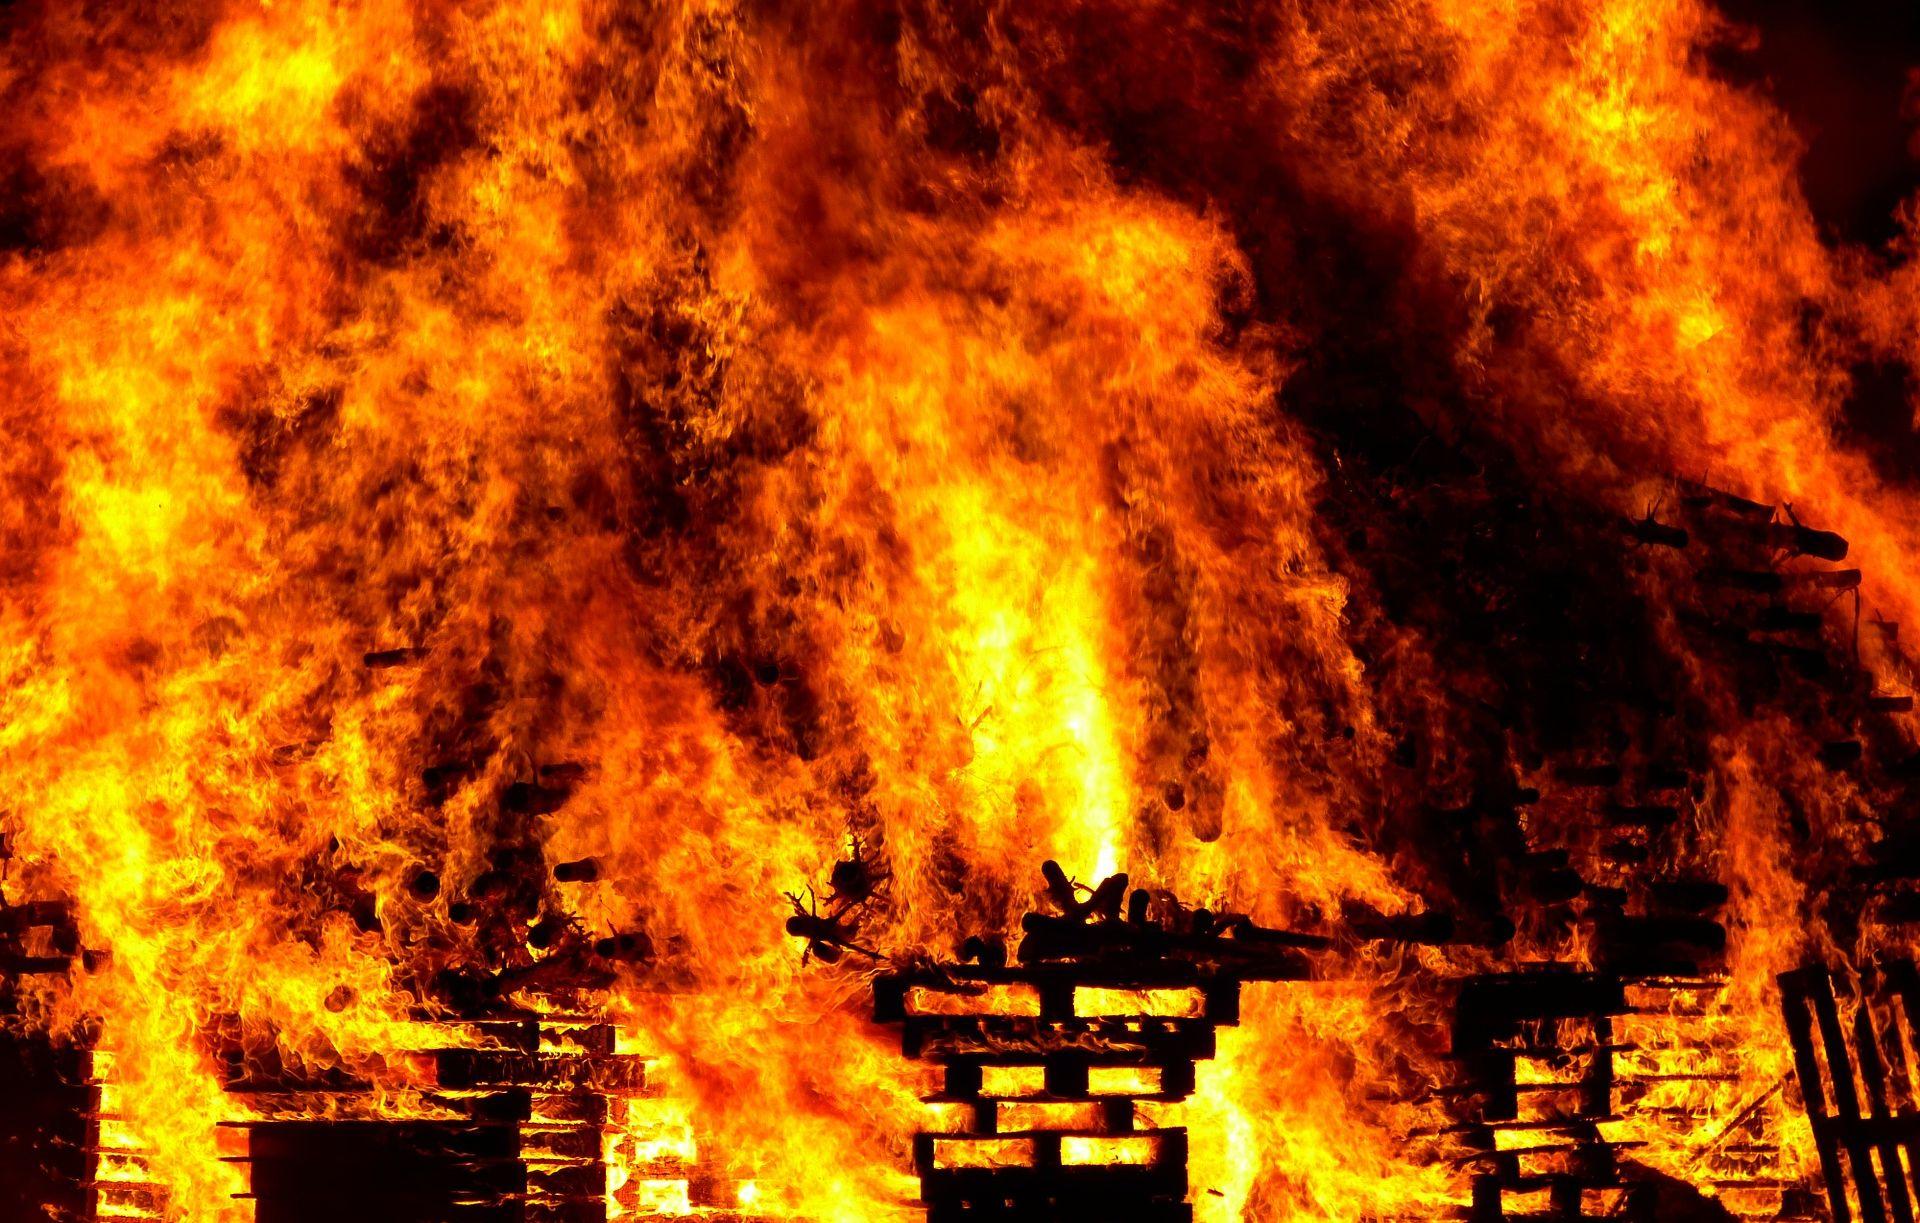 IVANIĆ GRAD Na farmi izgorjelo gotovo 20 000 pilića